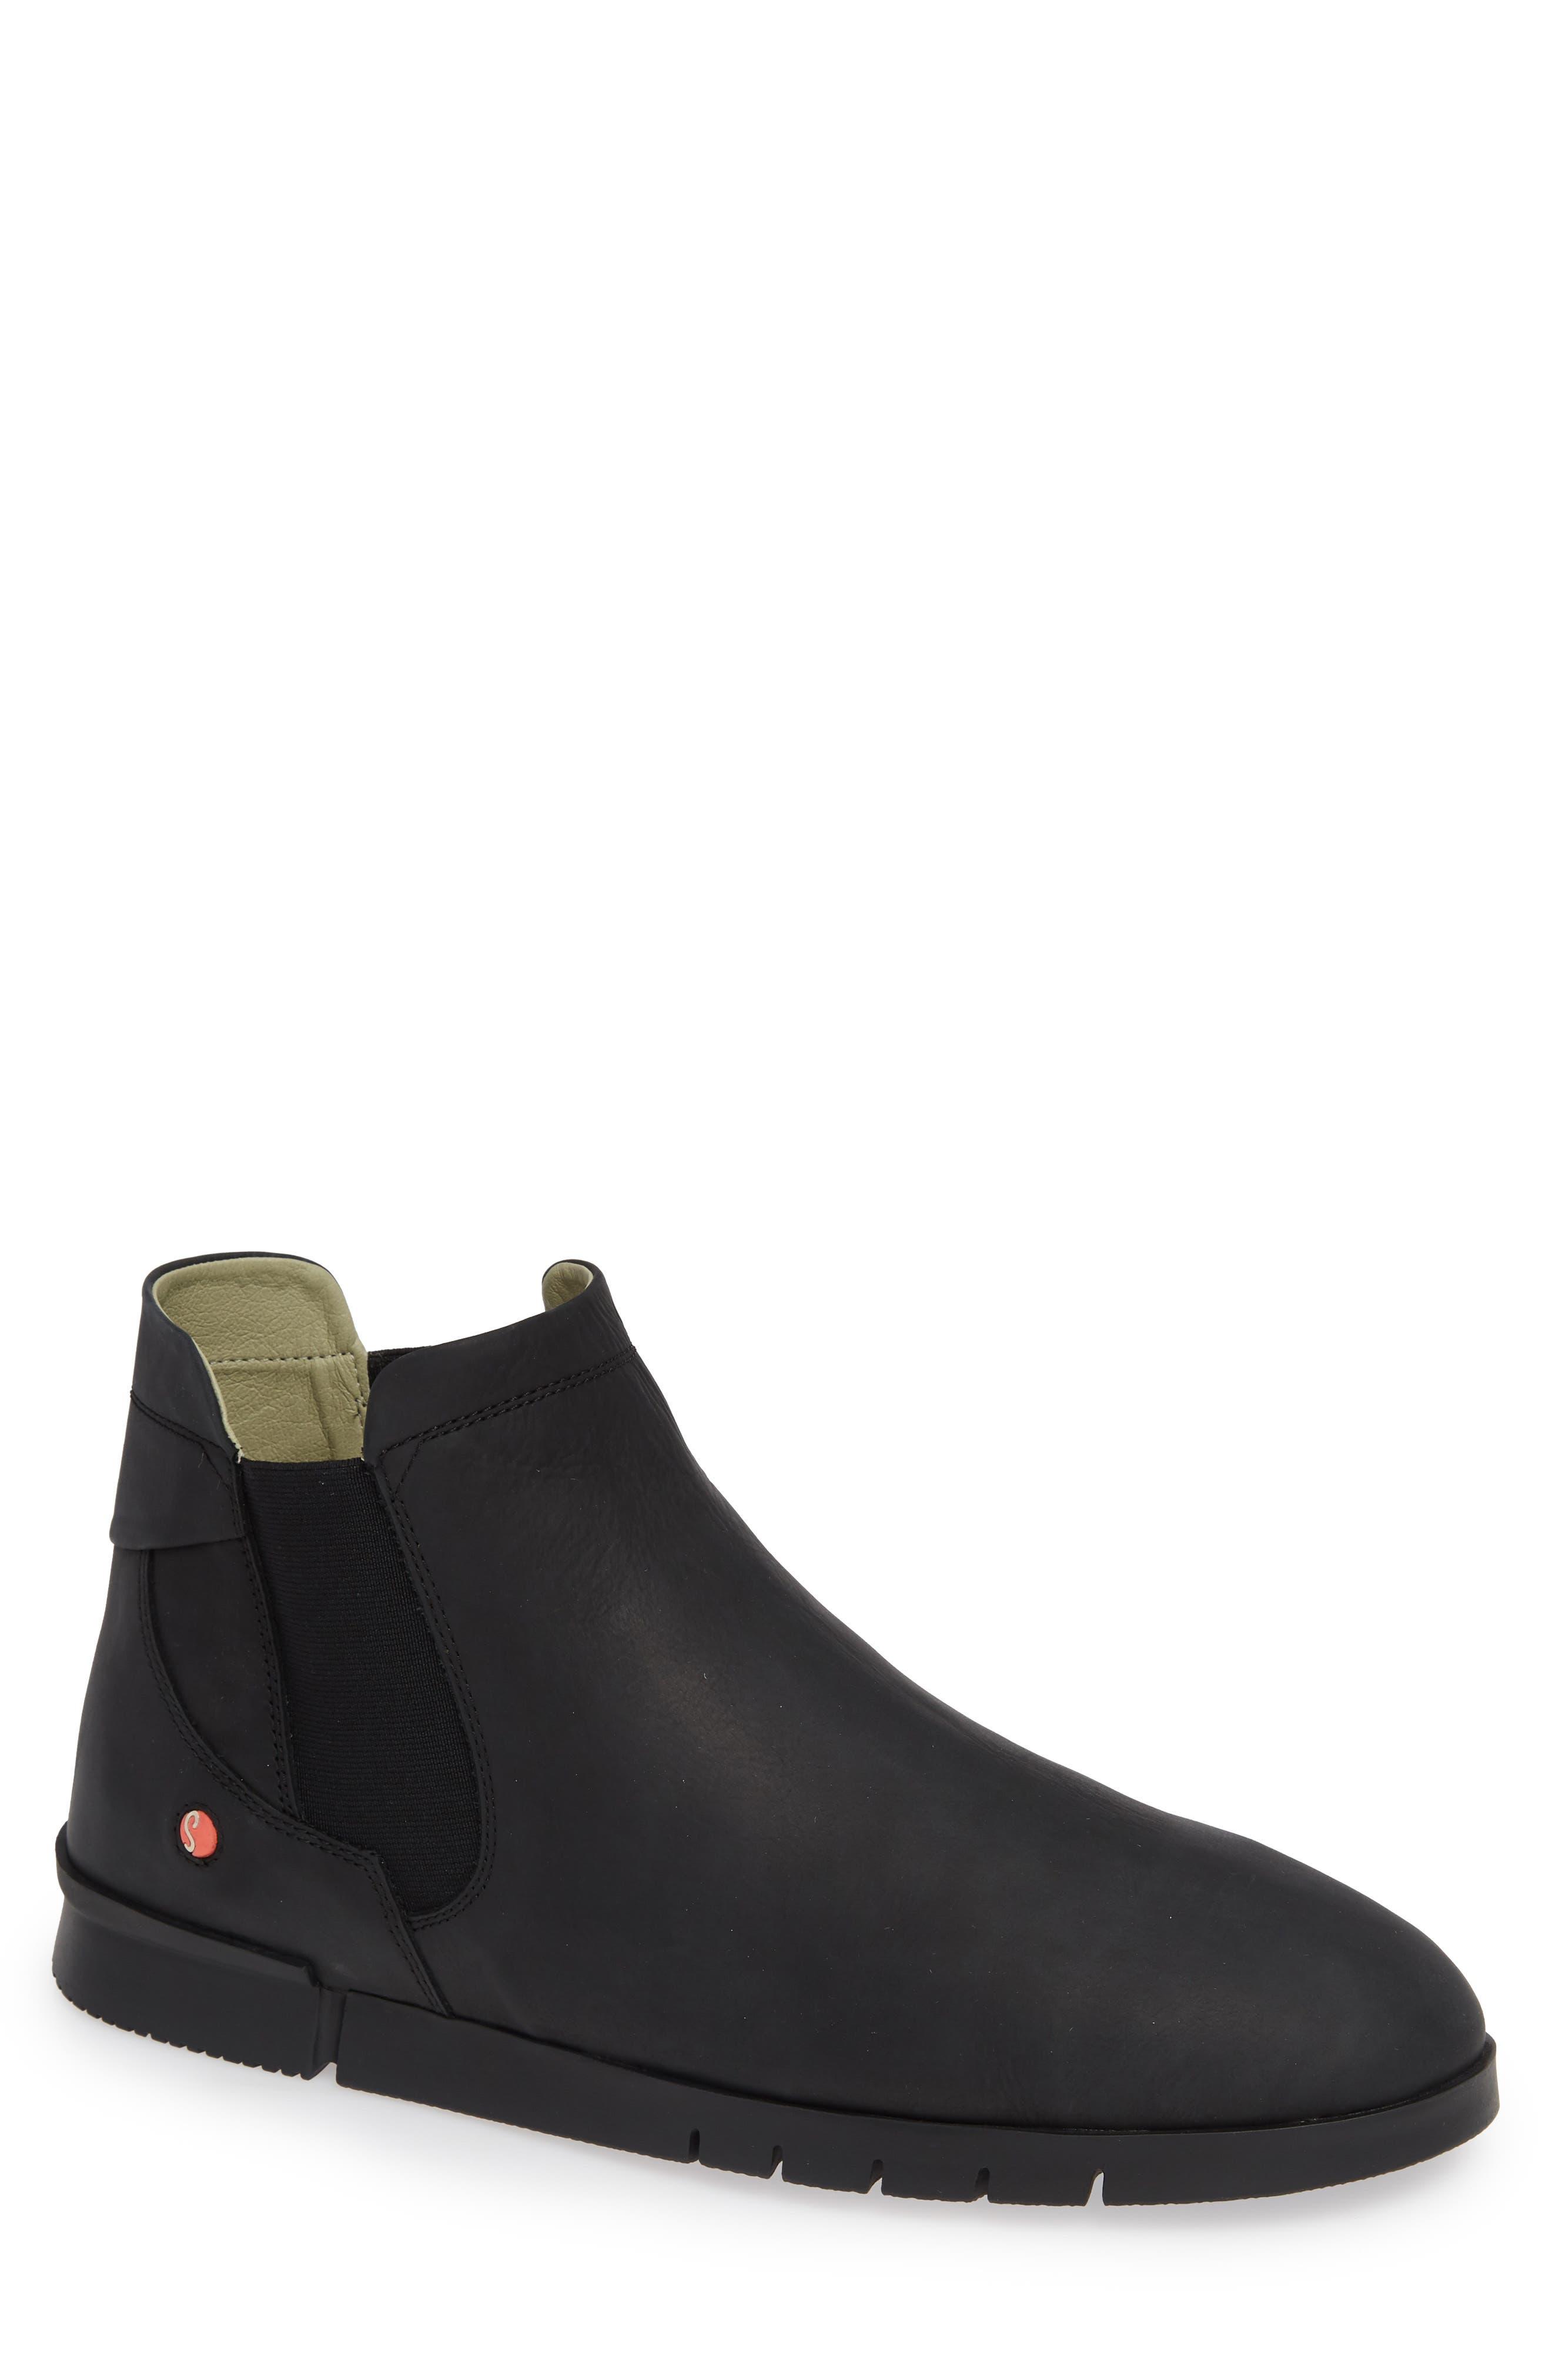 Cae Boot,                             Main thumbnail 1, color,                             BLACK CORGI LEATHER